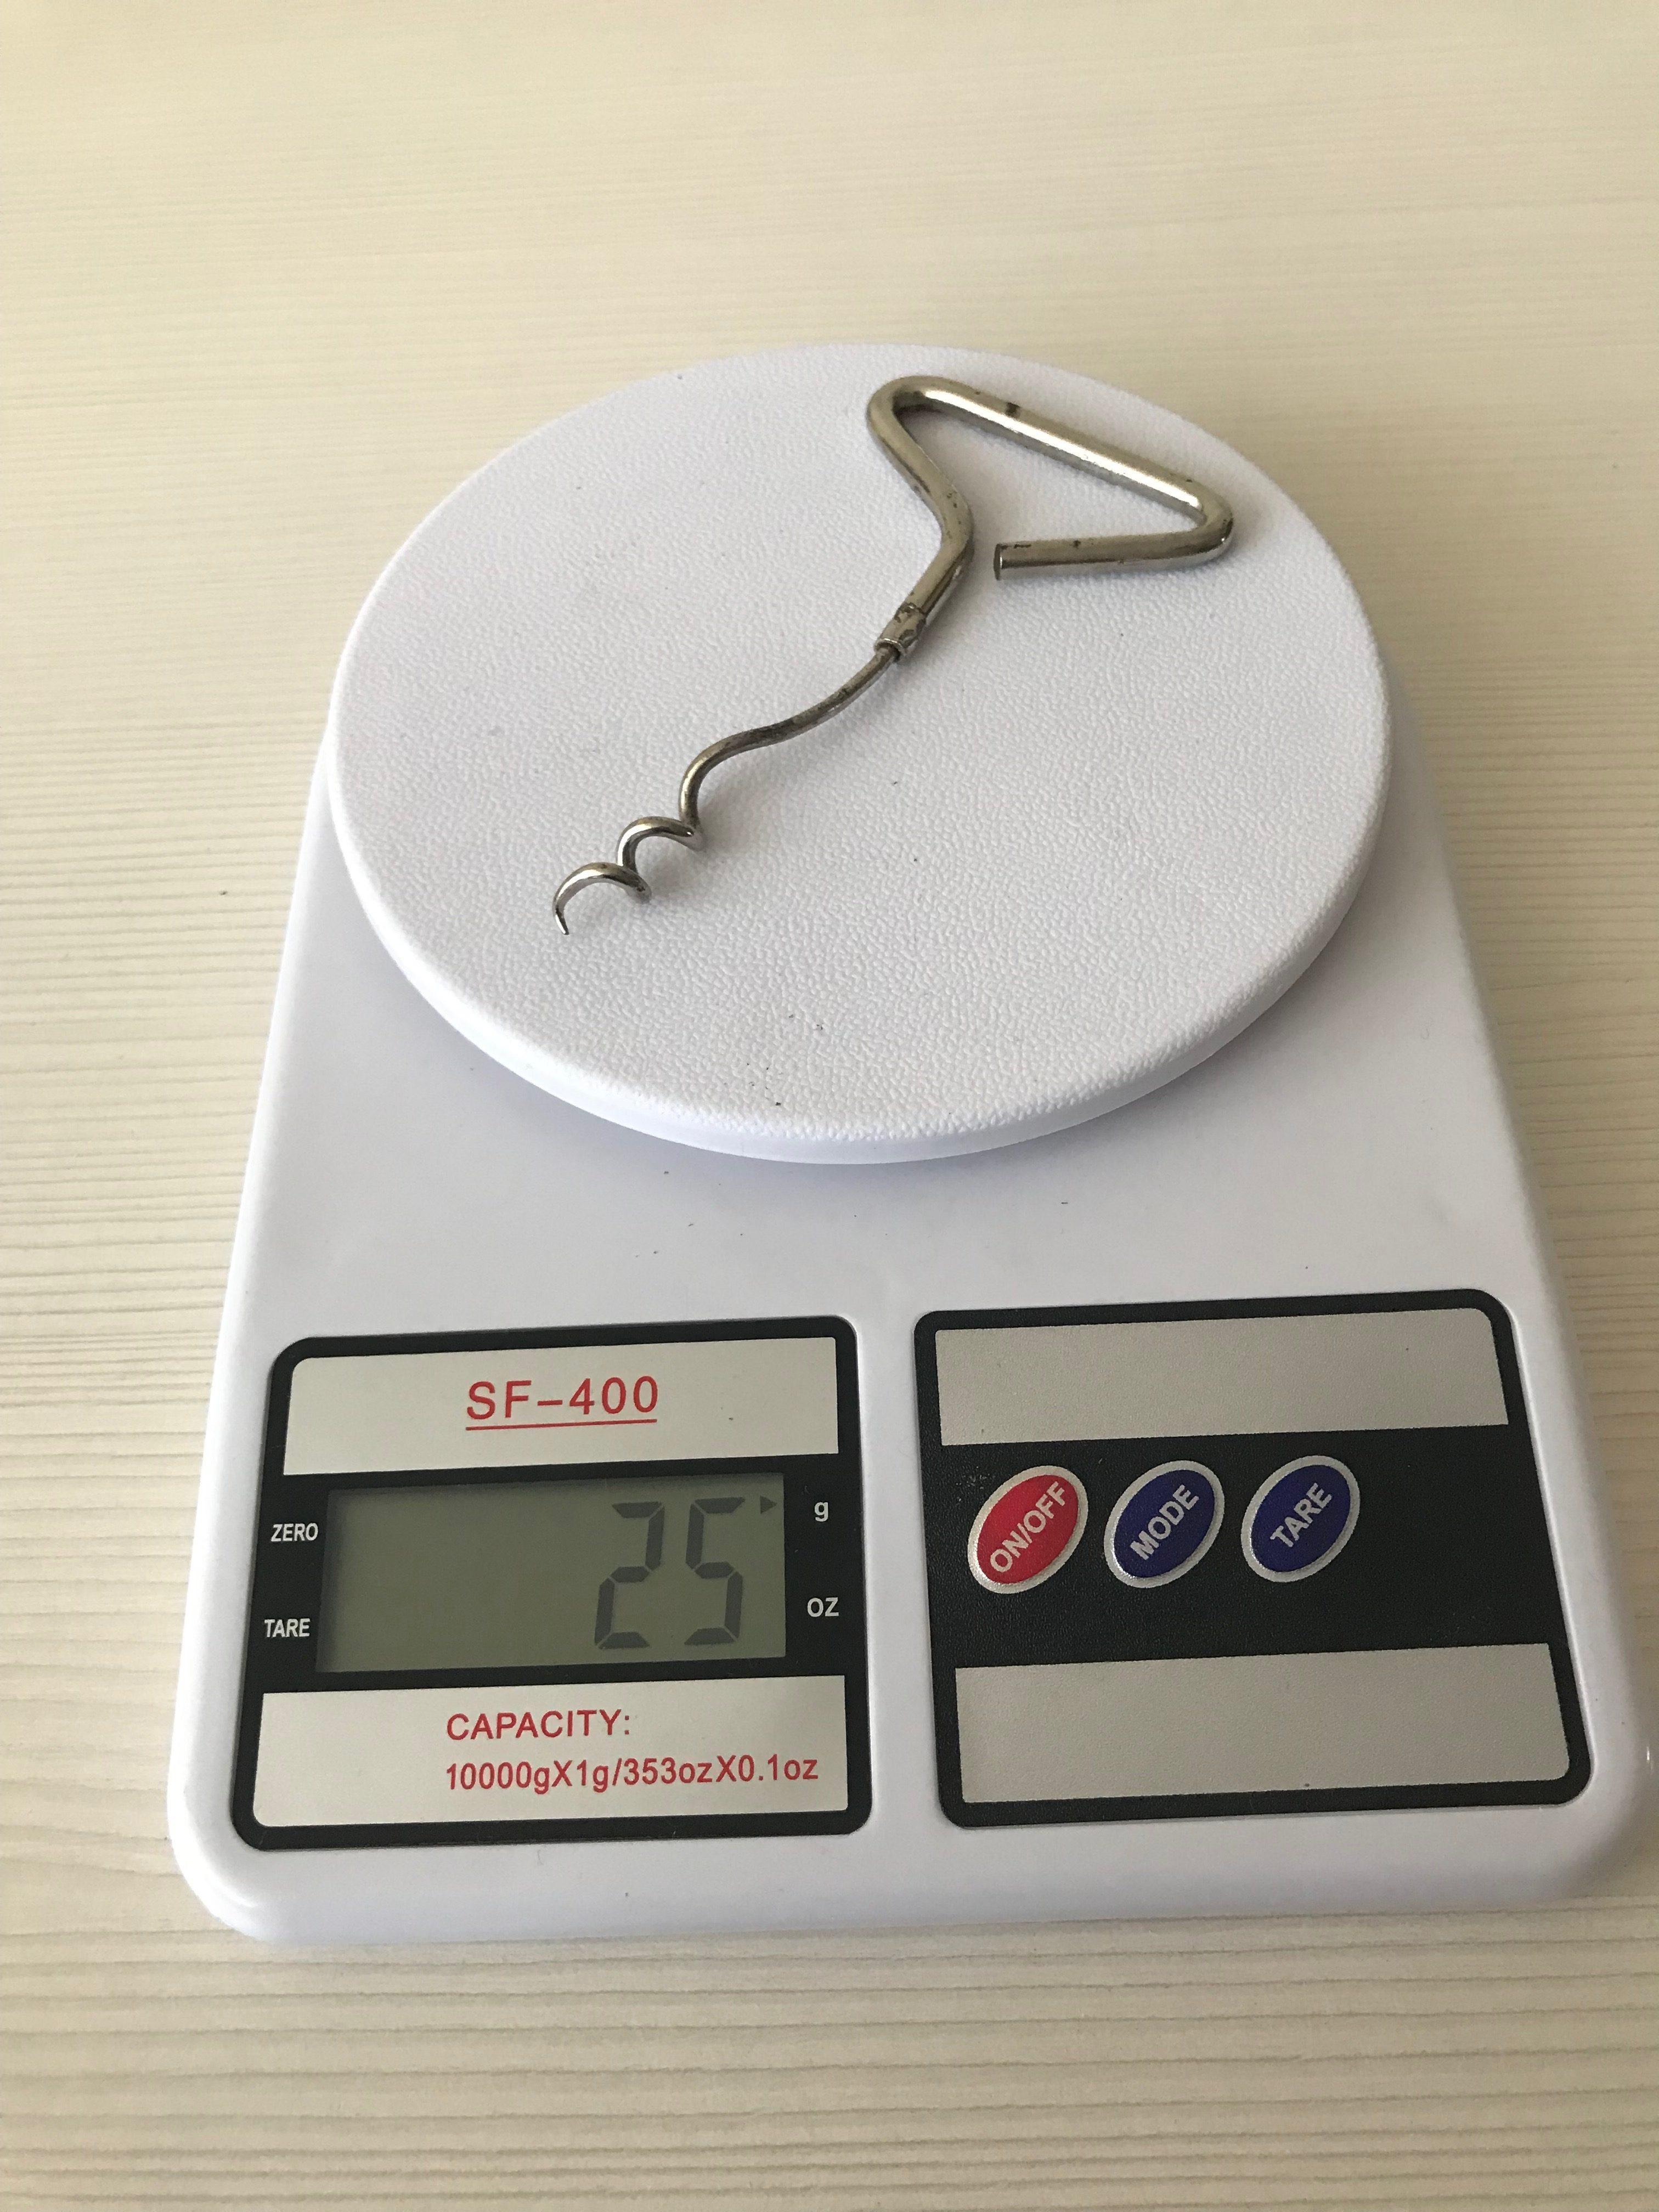 вес штопора металлического